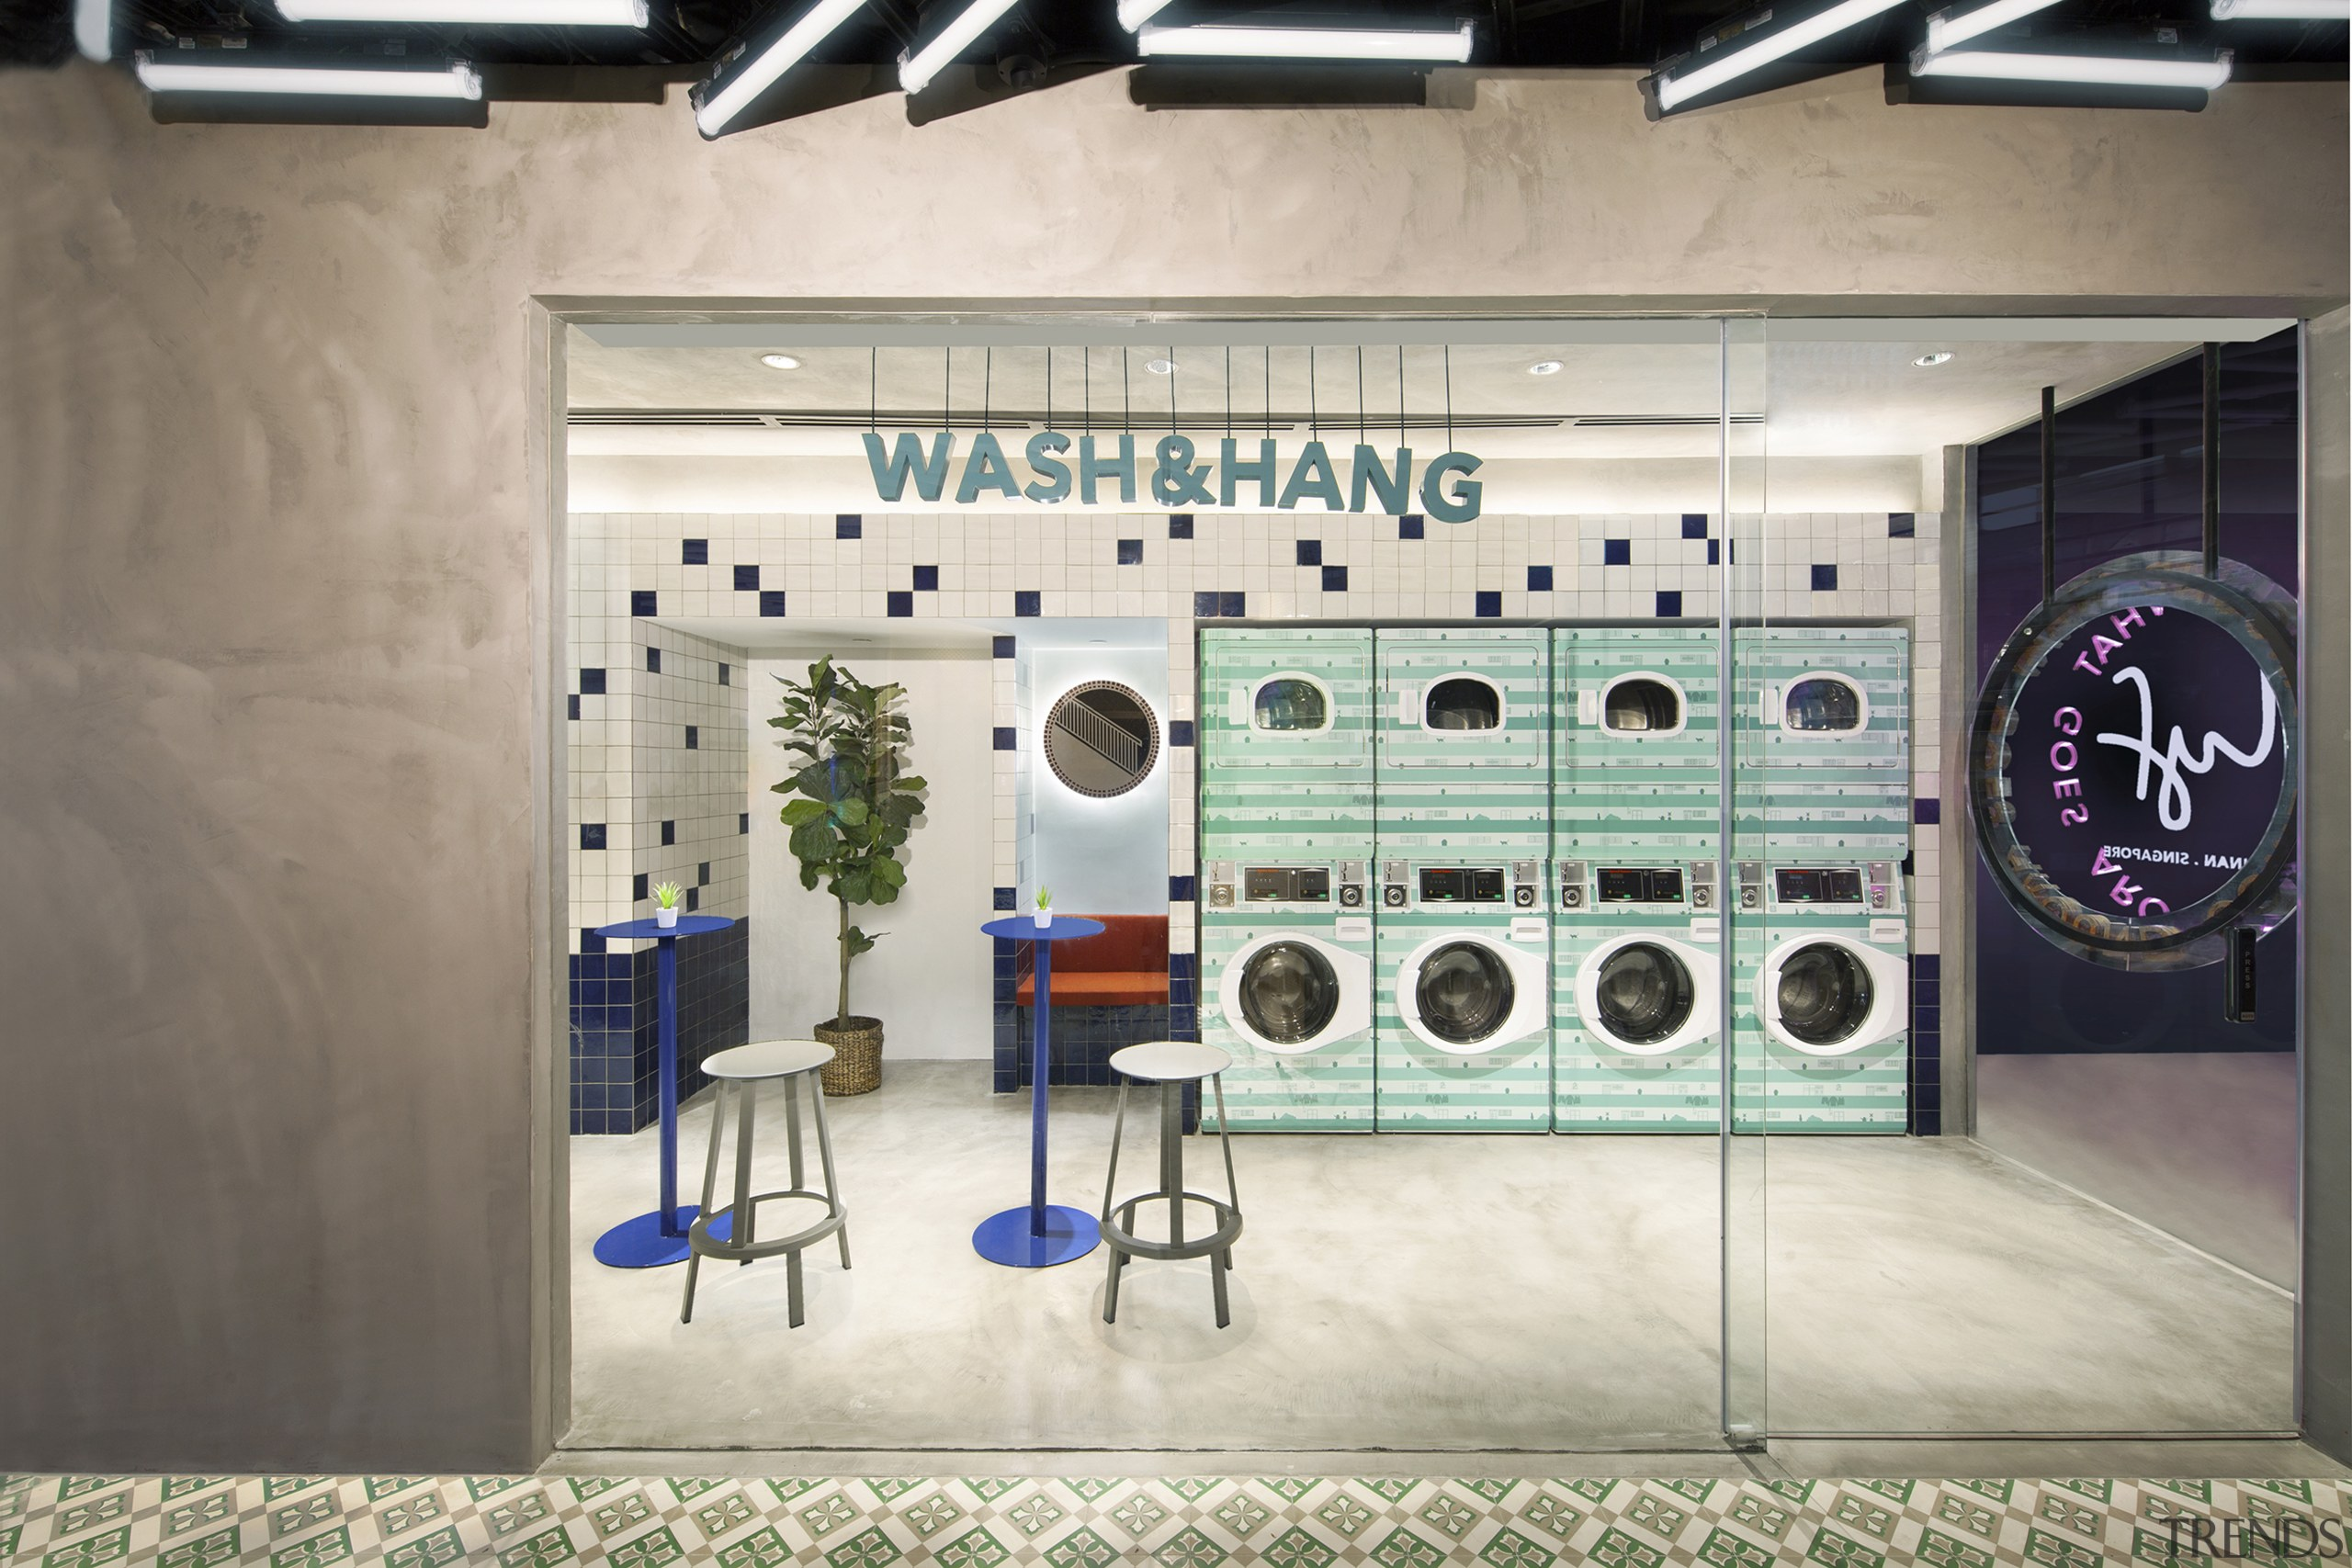 Wash & Hang takes on a more social building, design, eyewear, interior design, room, gray, white